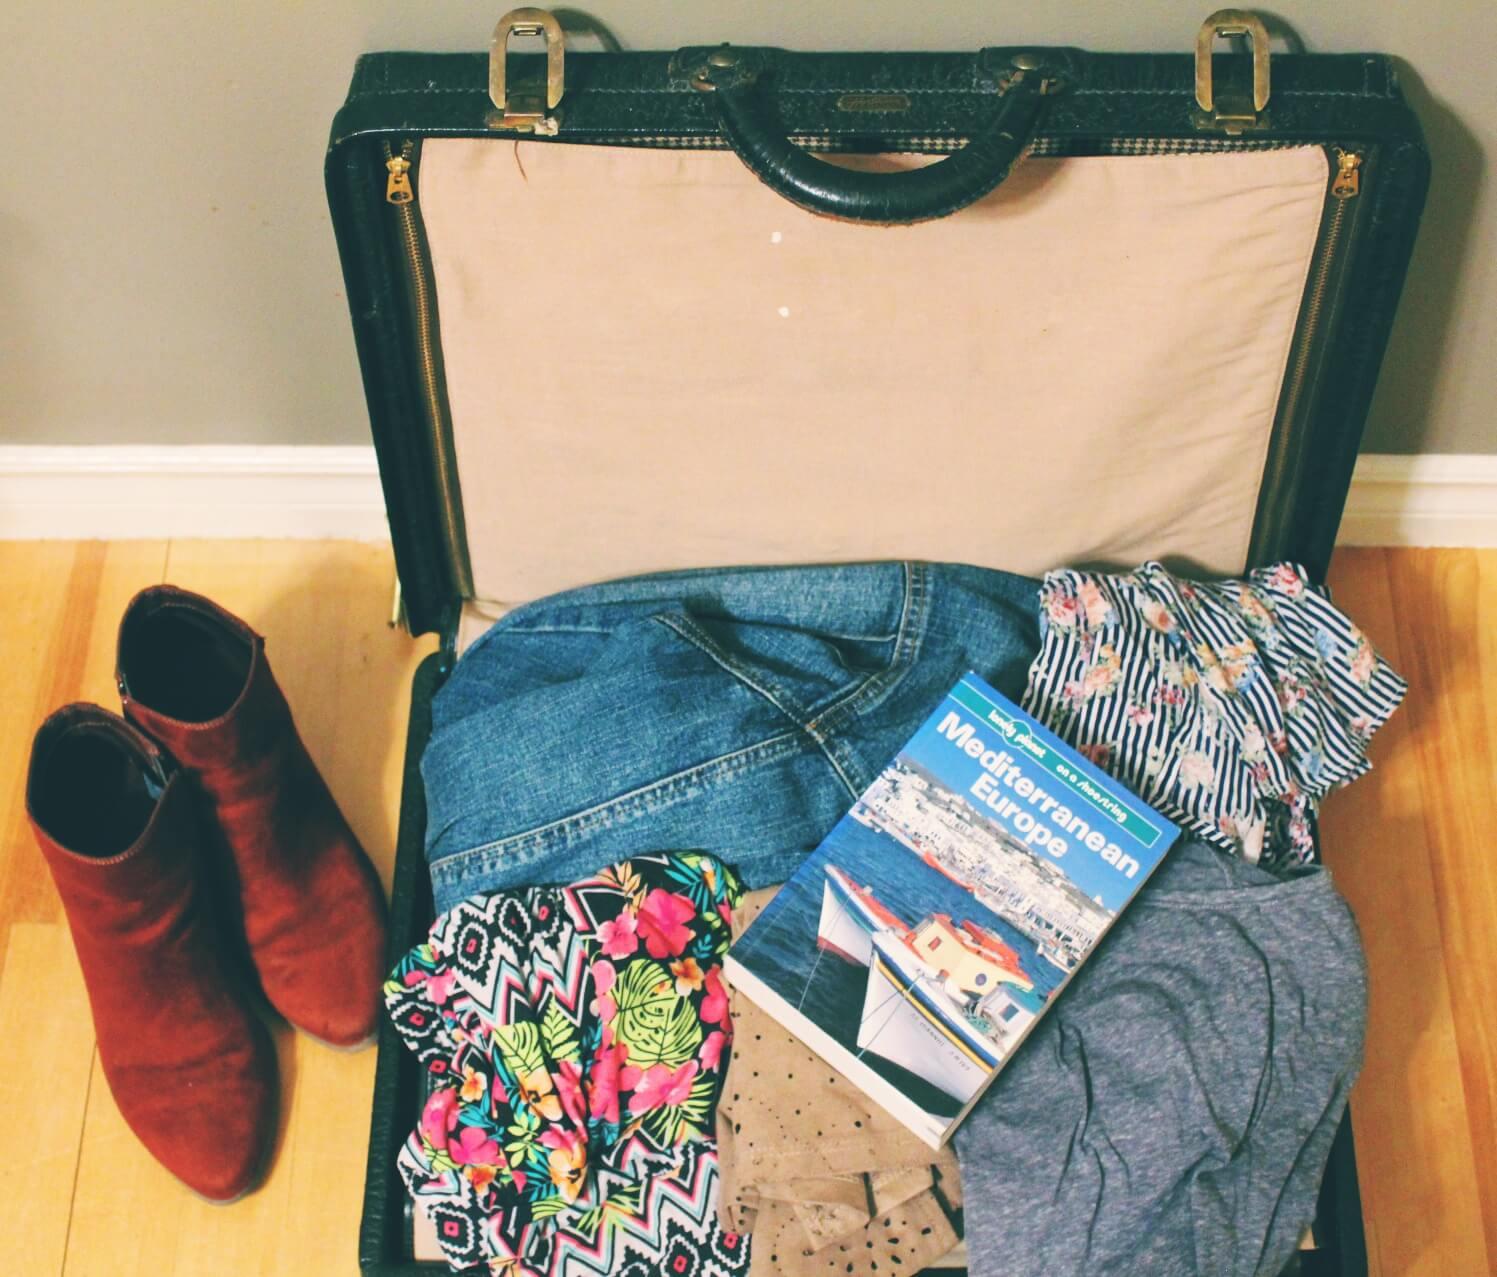 How To Prepare for Long Term Travel: A Before You Go Checklist